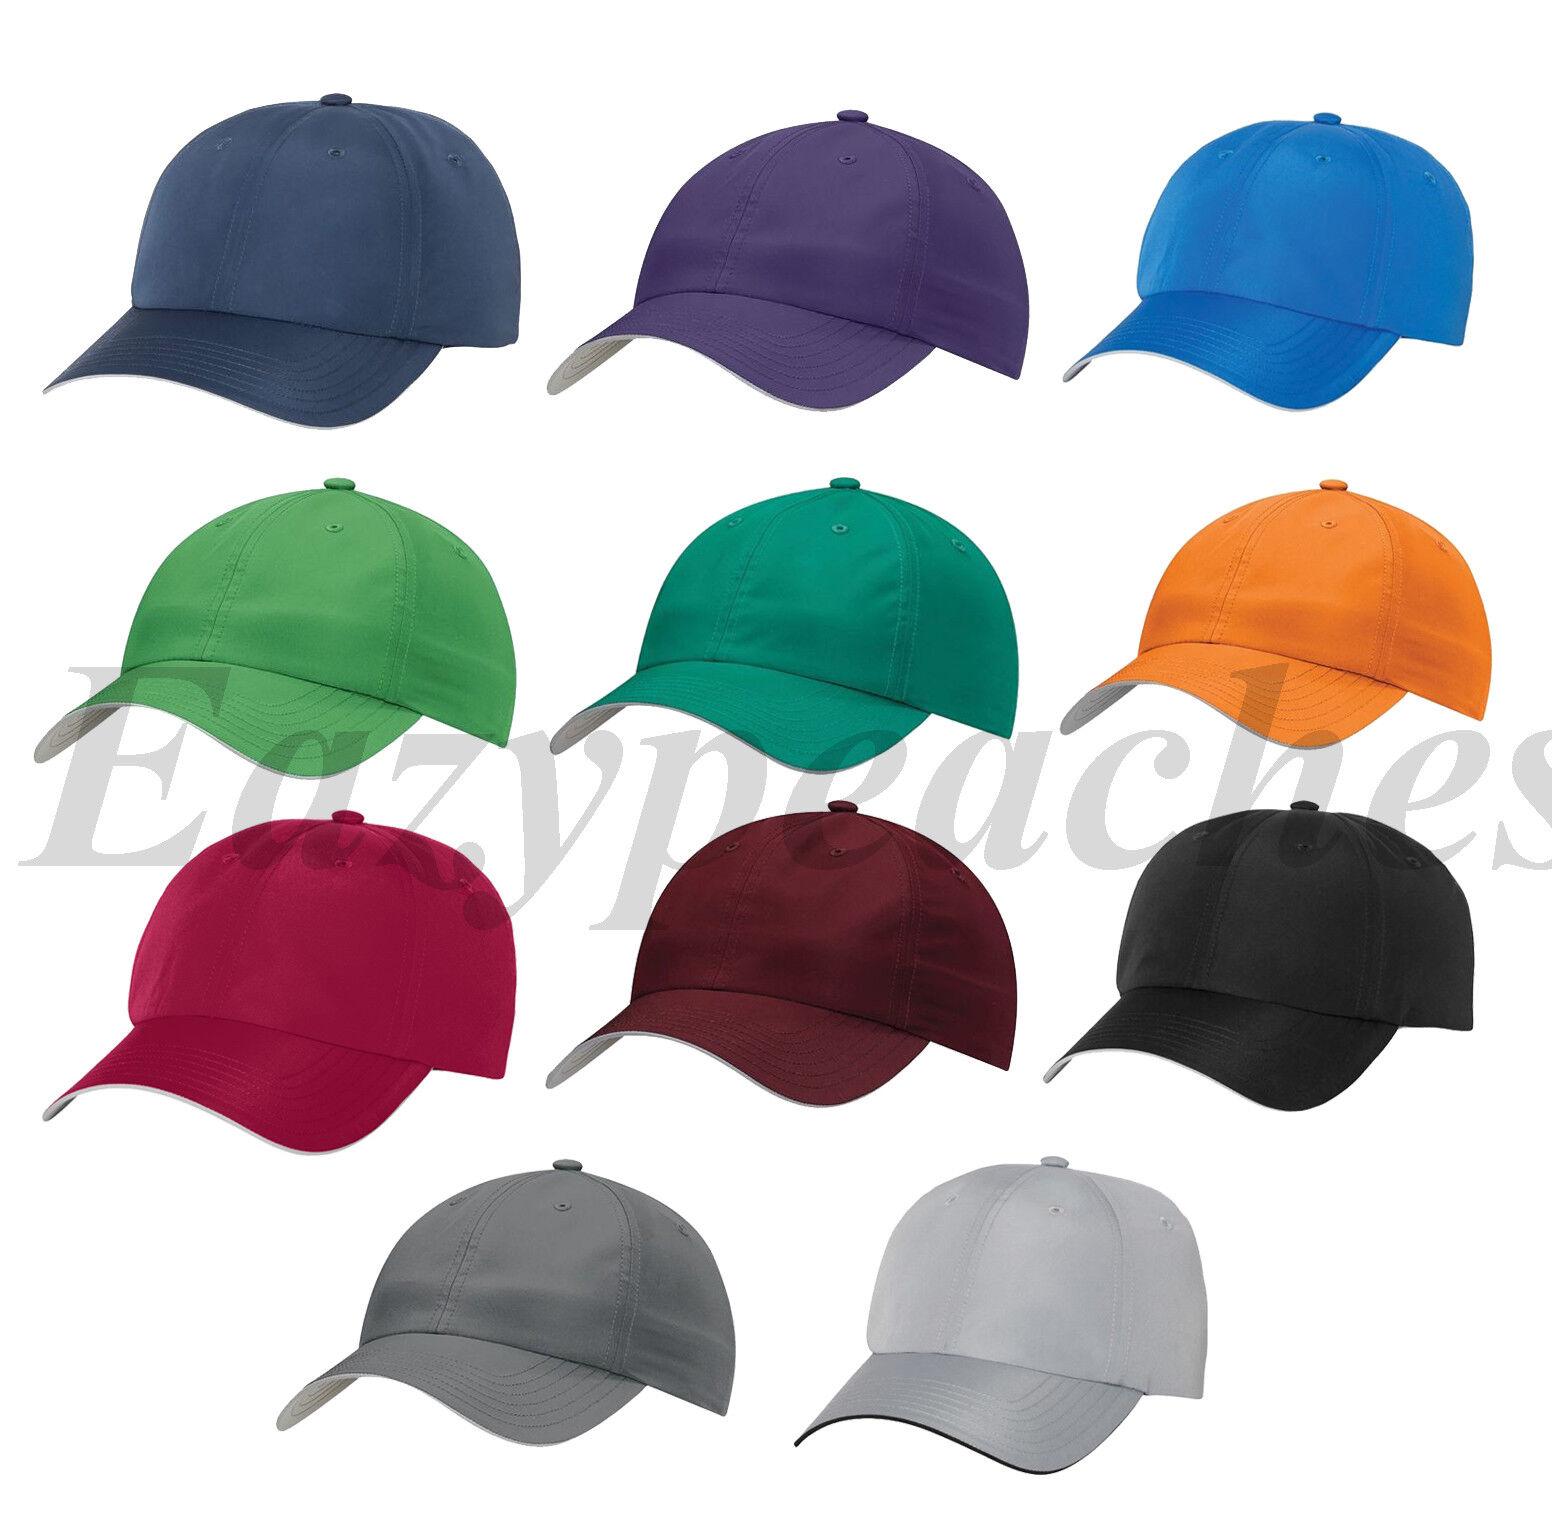 ADIDAS - Adjustable GOLF HAT, NEW Men's Poly Performance Rel